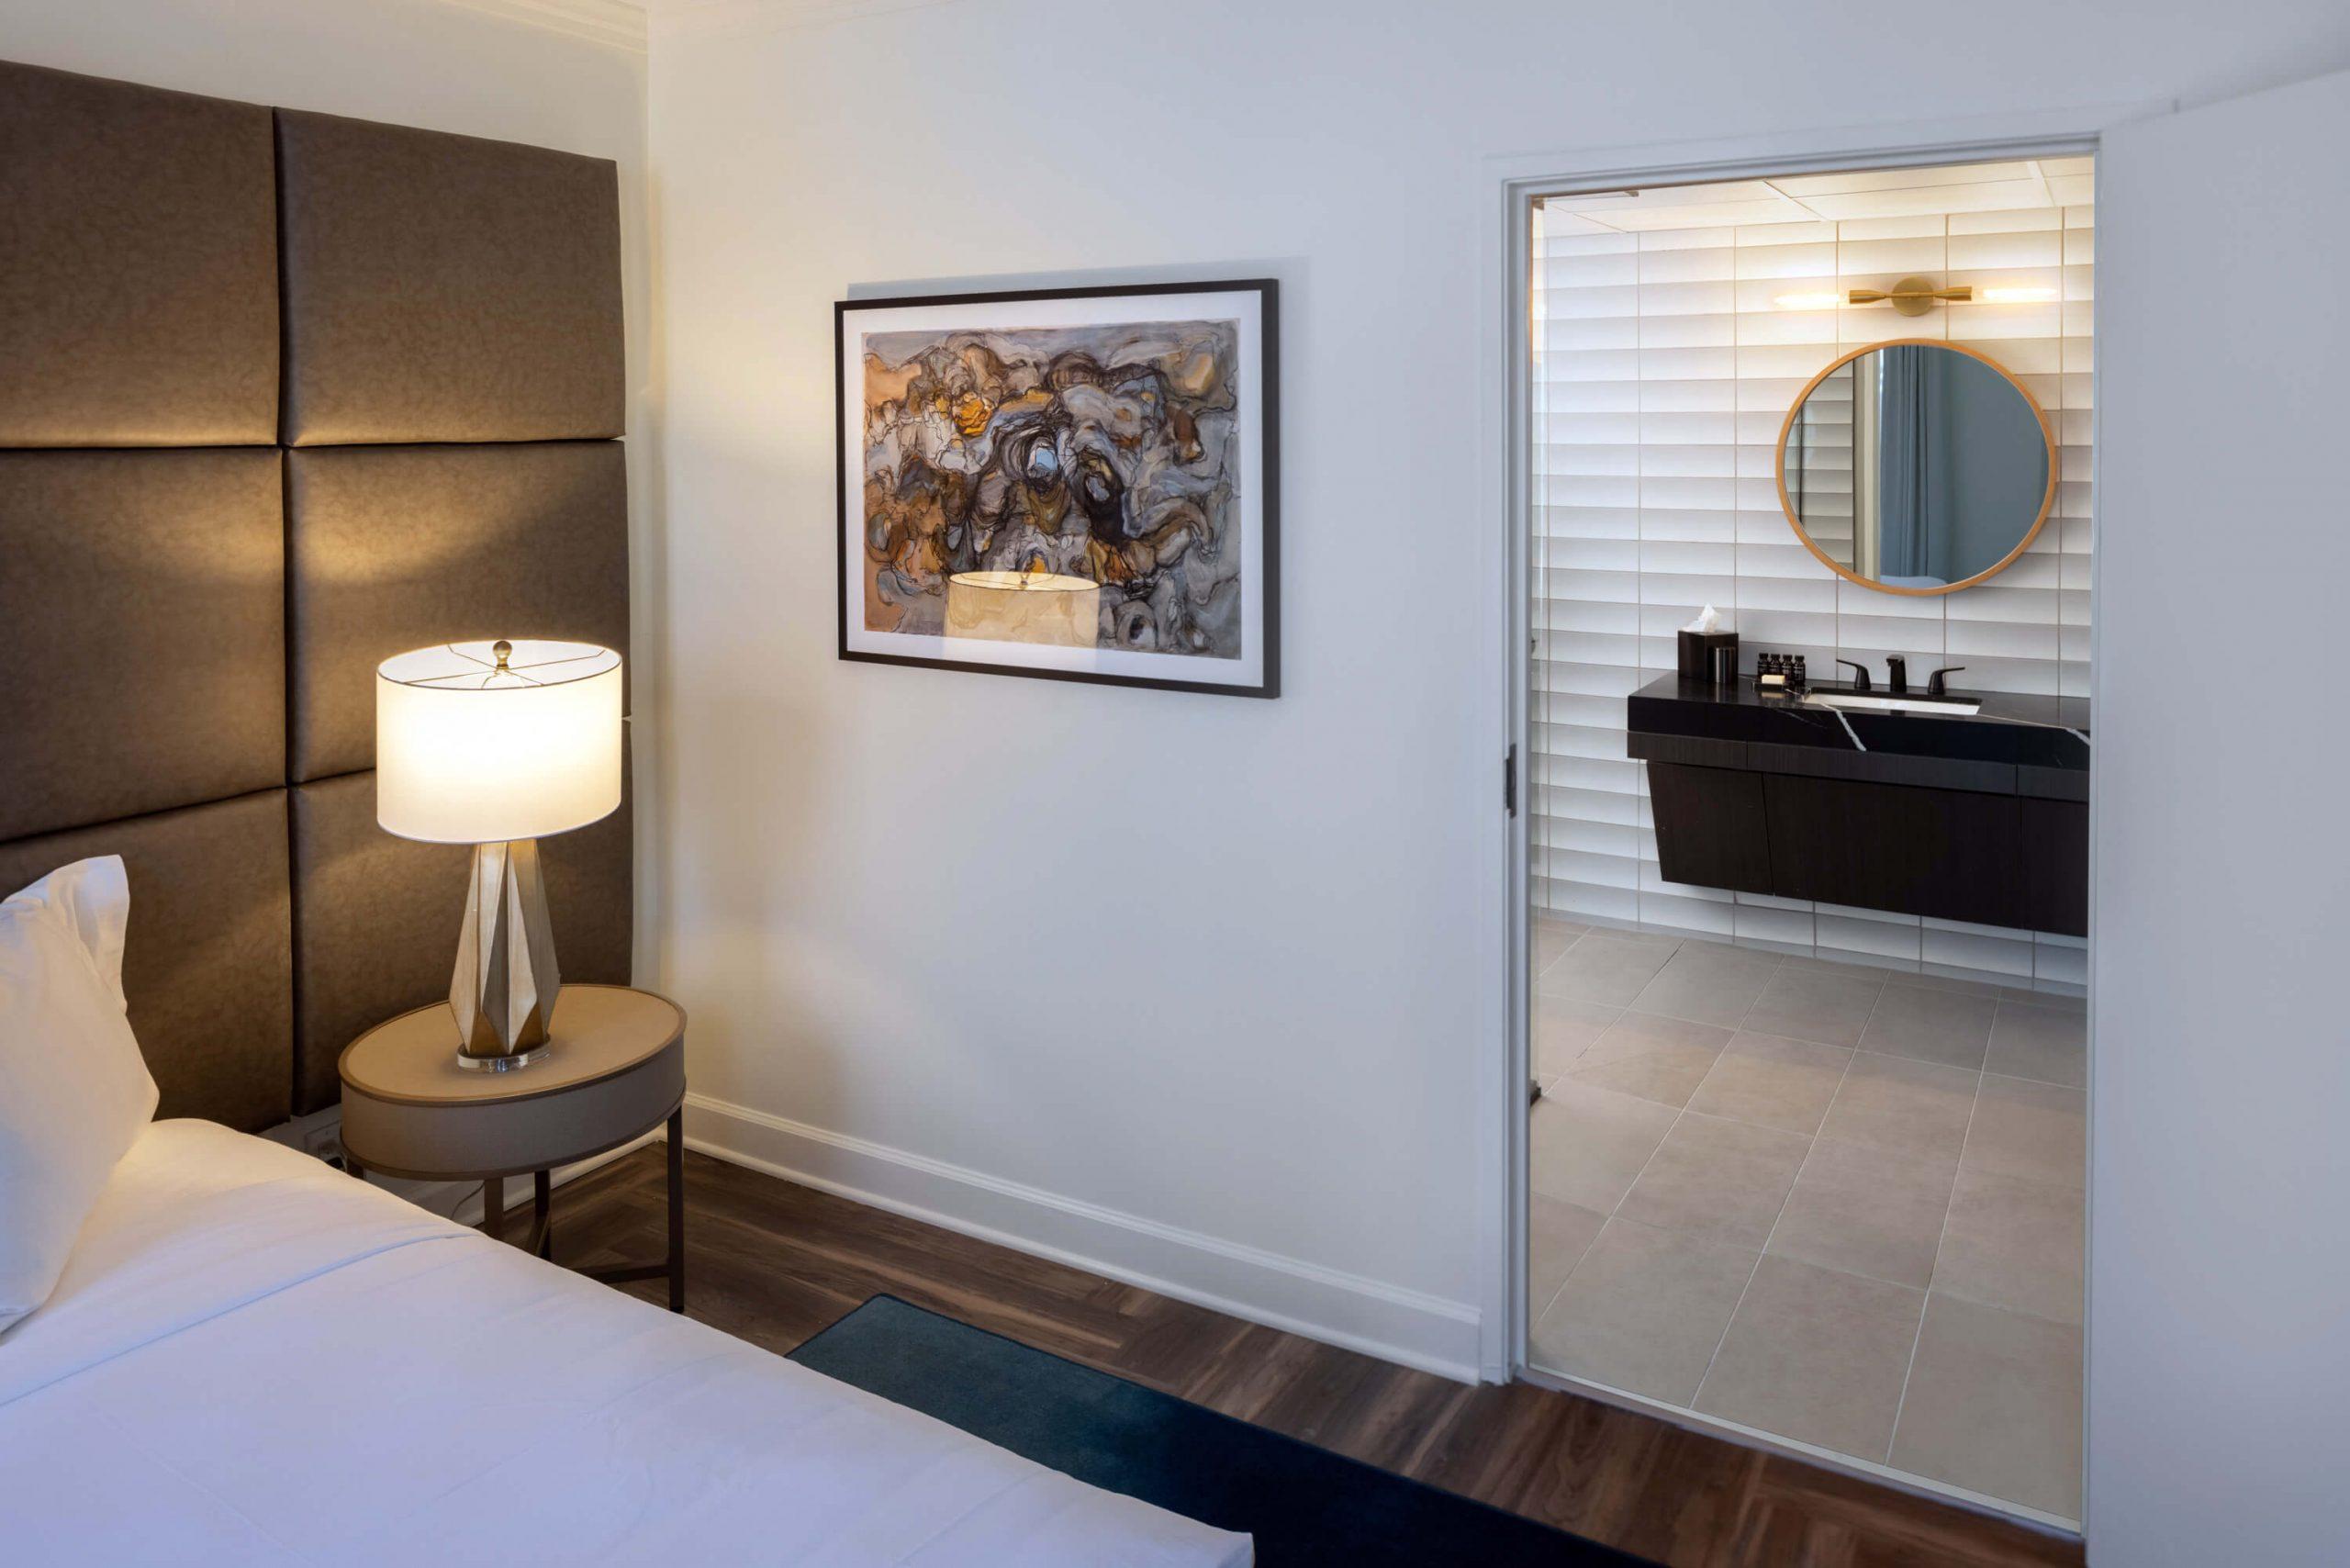 ADA accessible hotel room